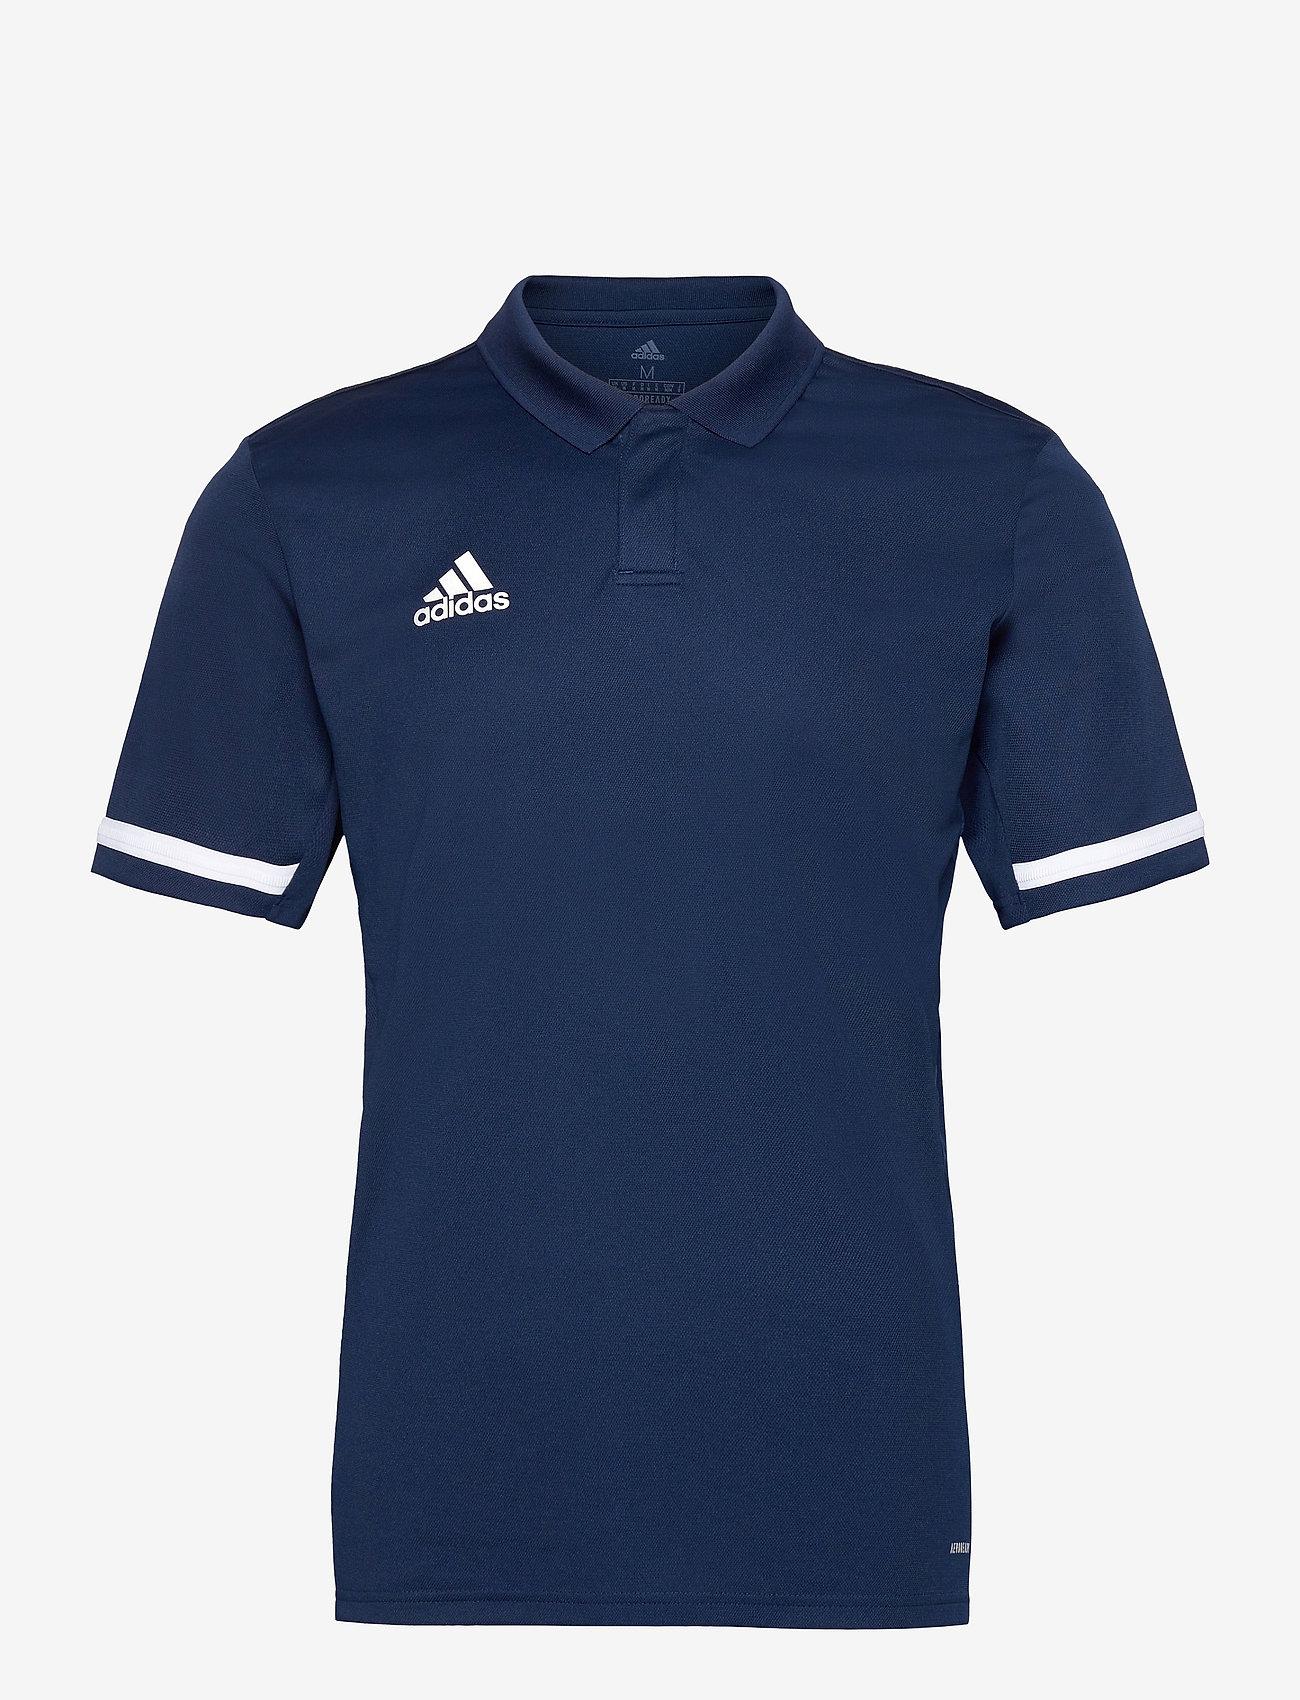 adidas Performance - Team 19 Polo Shirt - oberteile & t-shirts - navblu/white - 0